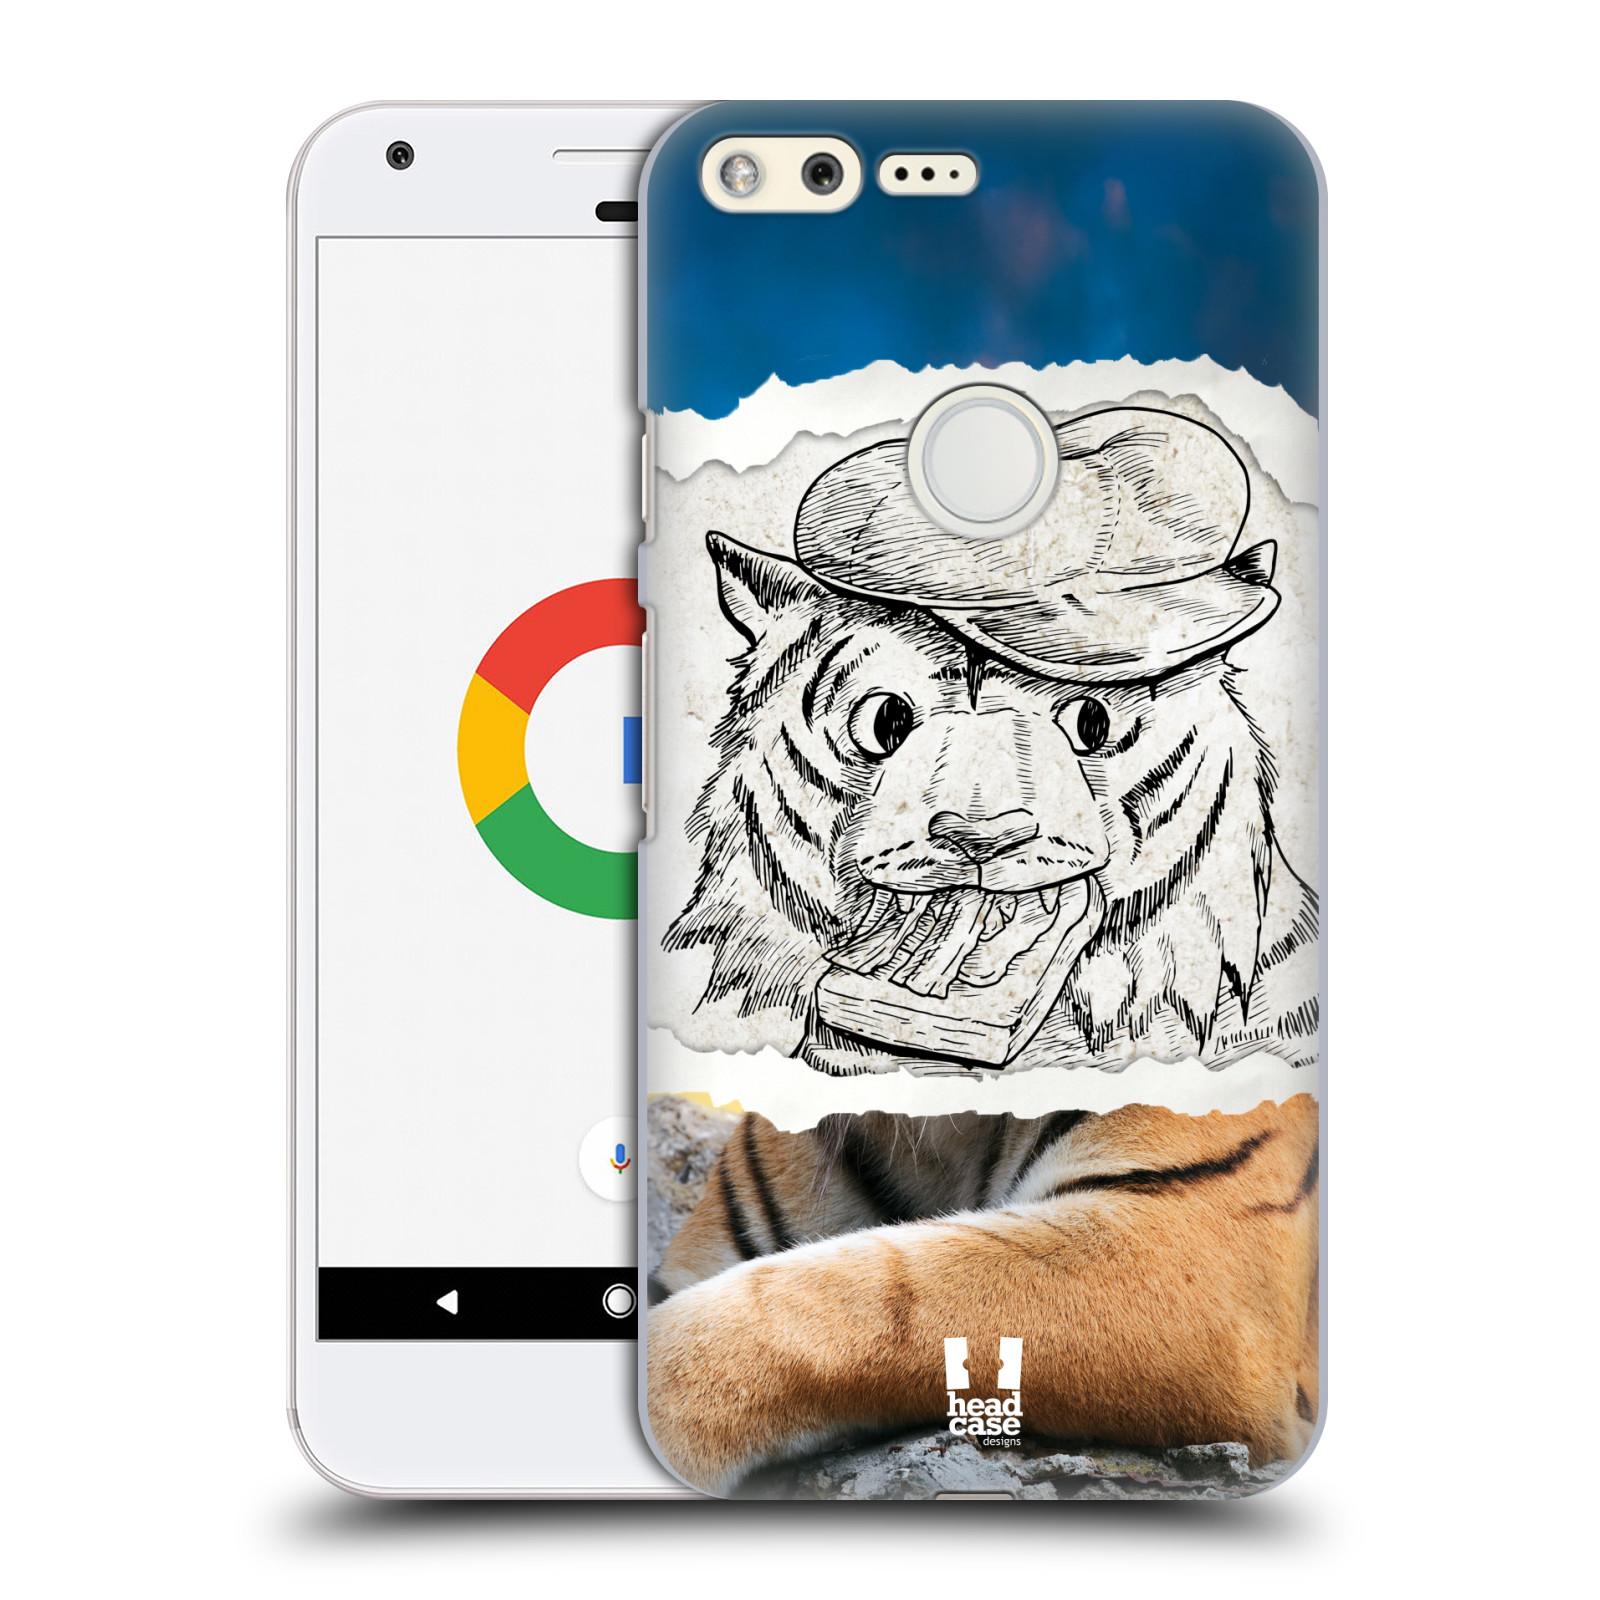 HEAD CASE plastový obal na mobil GOOGLE Pixel vzor zvířata koláž tygr fešák